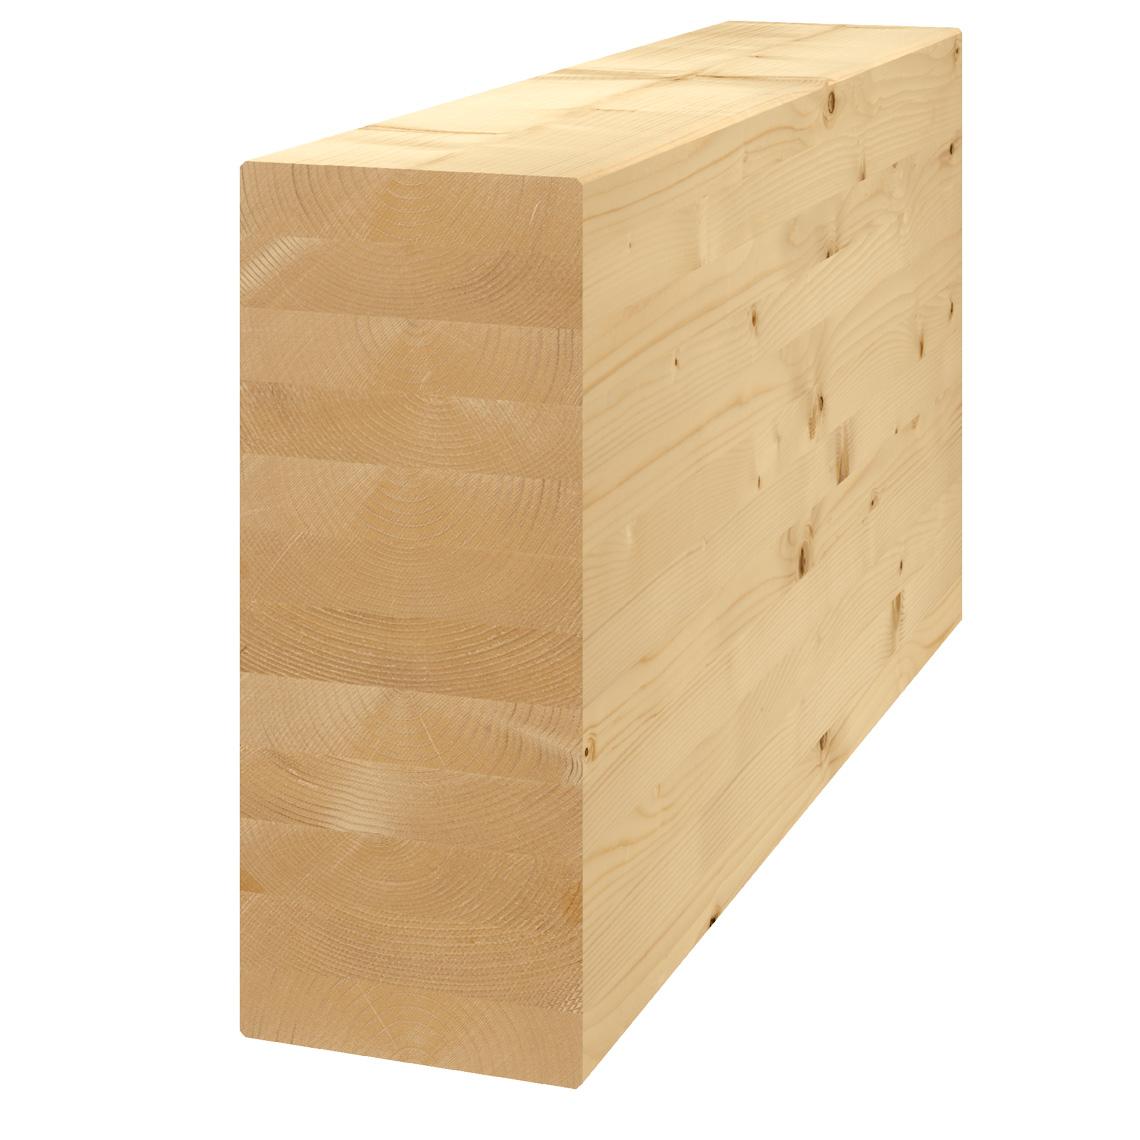 Brettschichtholz